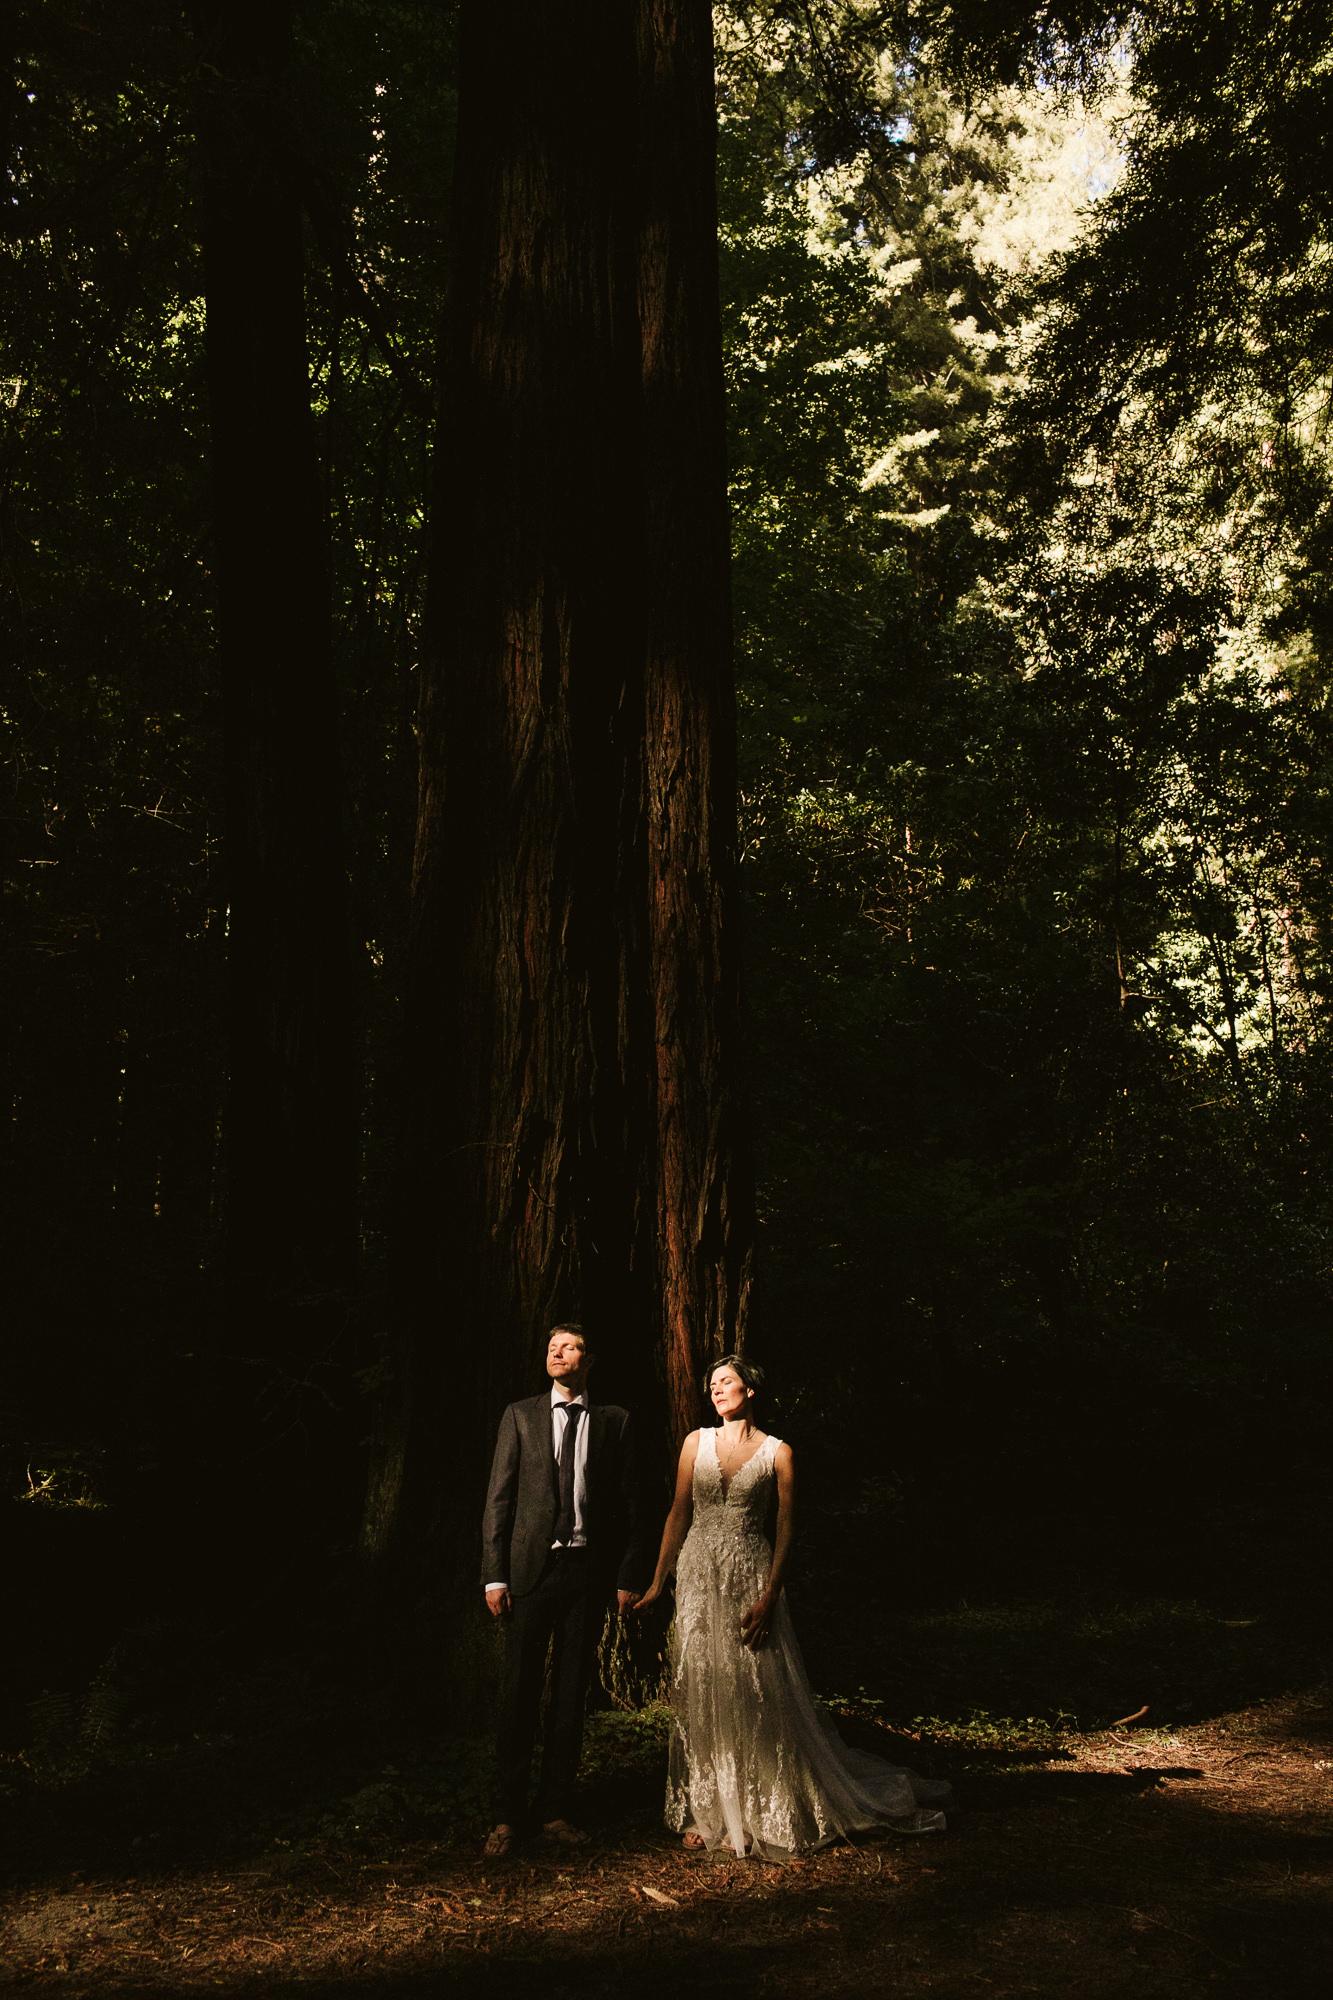 California-wedding-photographer-alfonso-flores-pamplin-groove-288.jpg